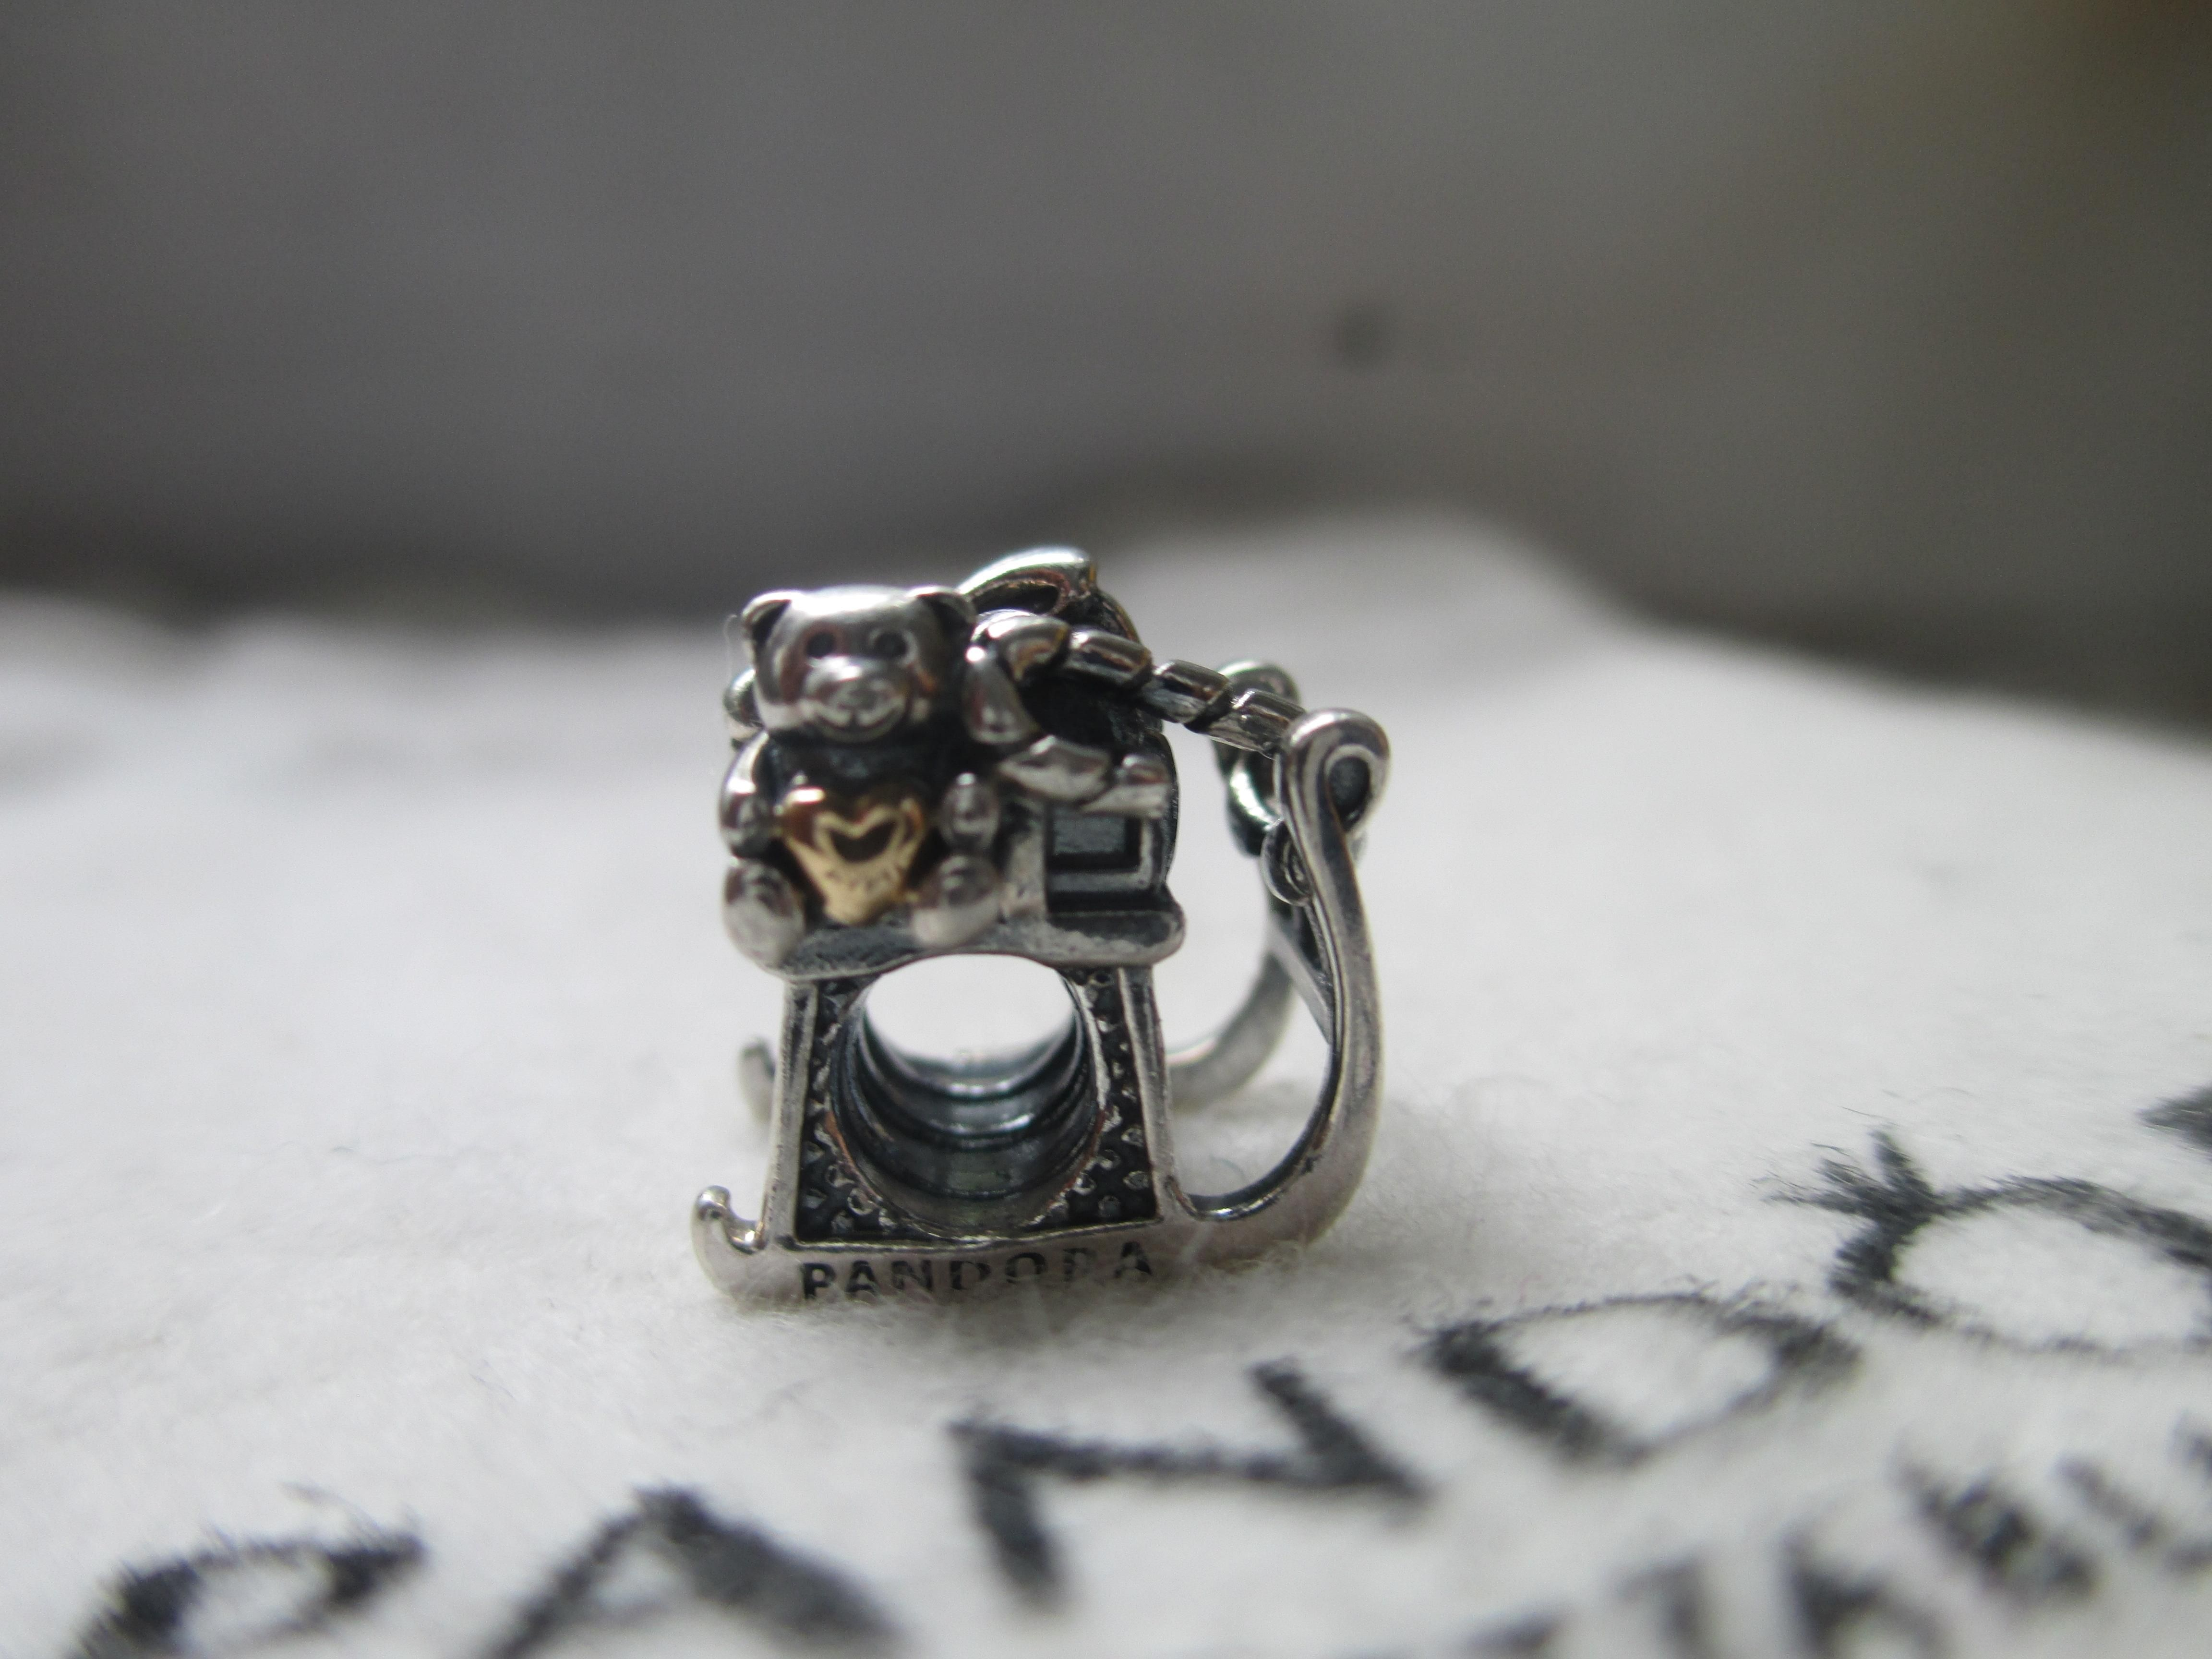 29ec78ffe Authentic Pandora Charm Christmas Sleigh Charm 925 14k ALE 791207 new. Free  shipping and guaranteed